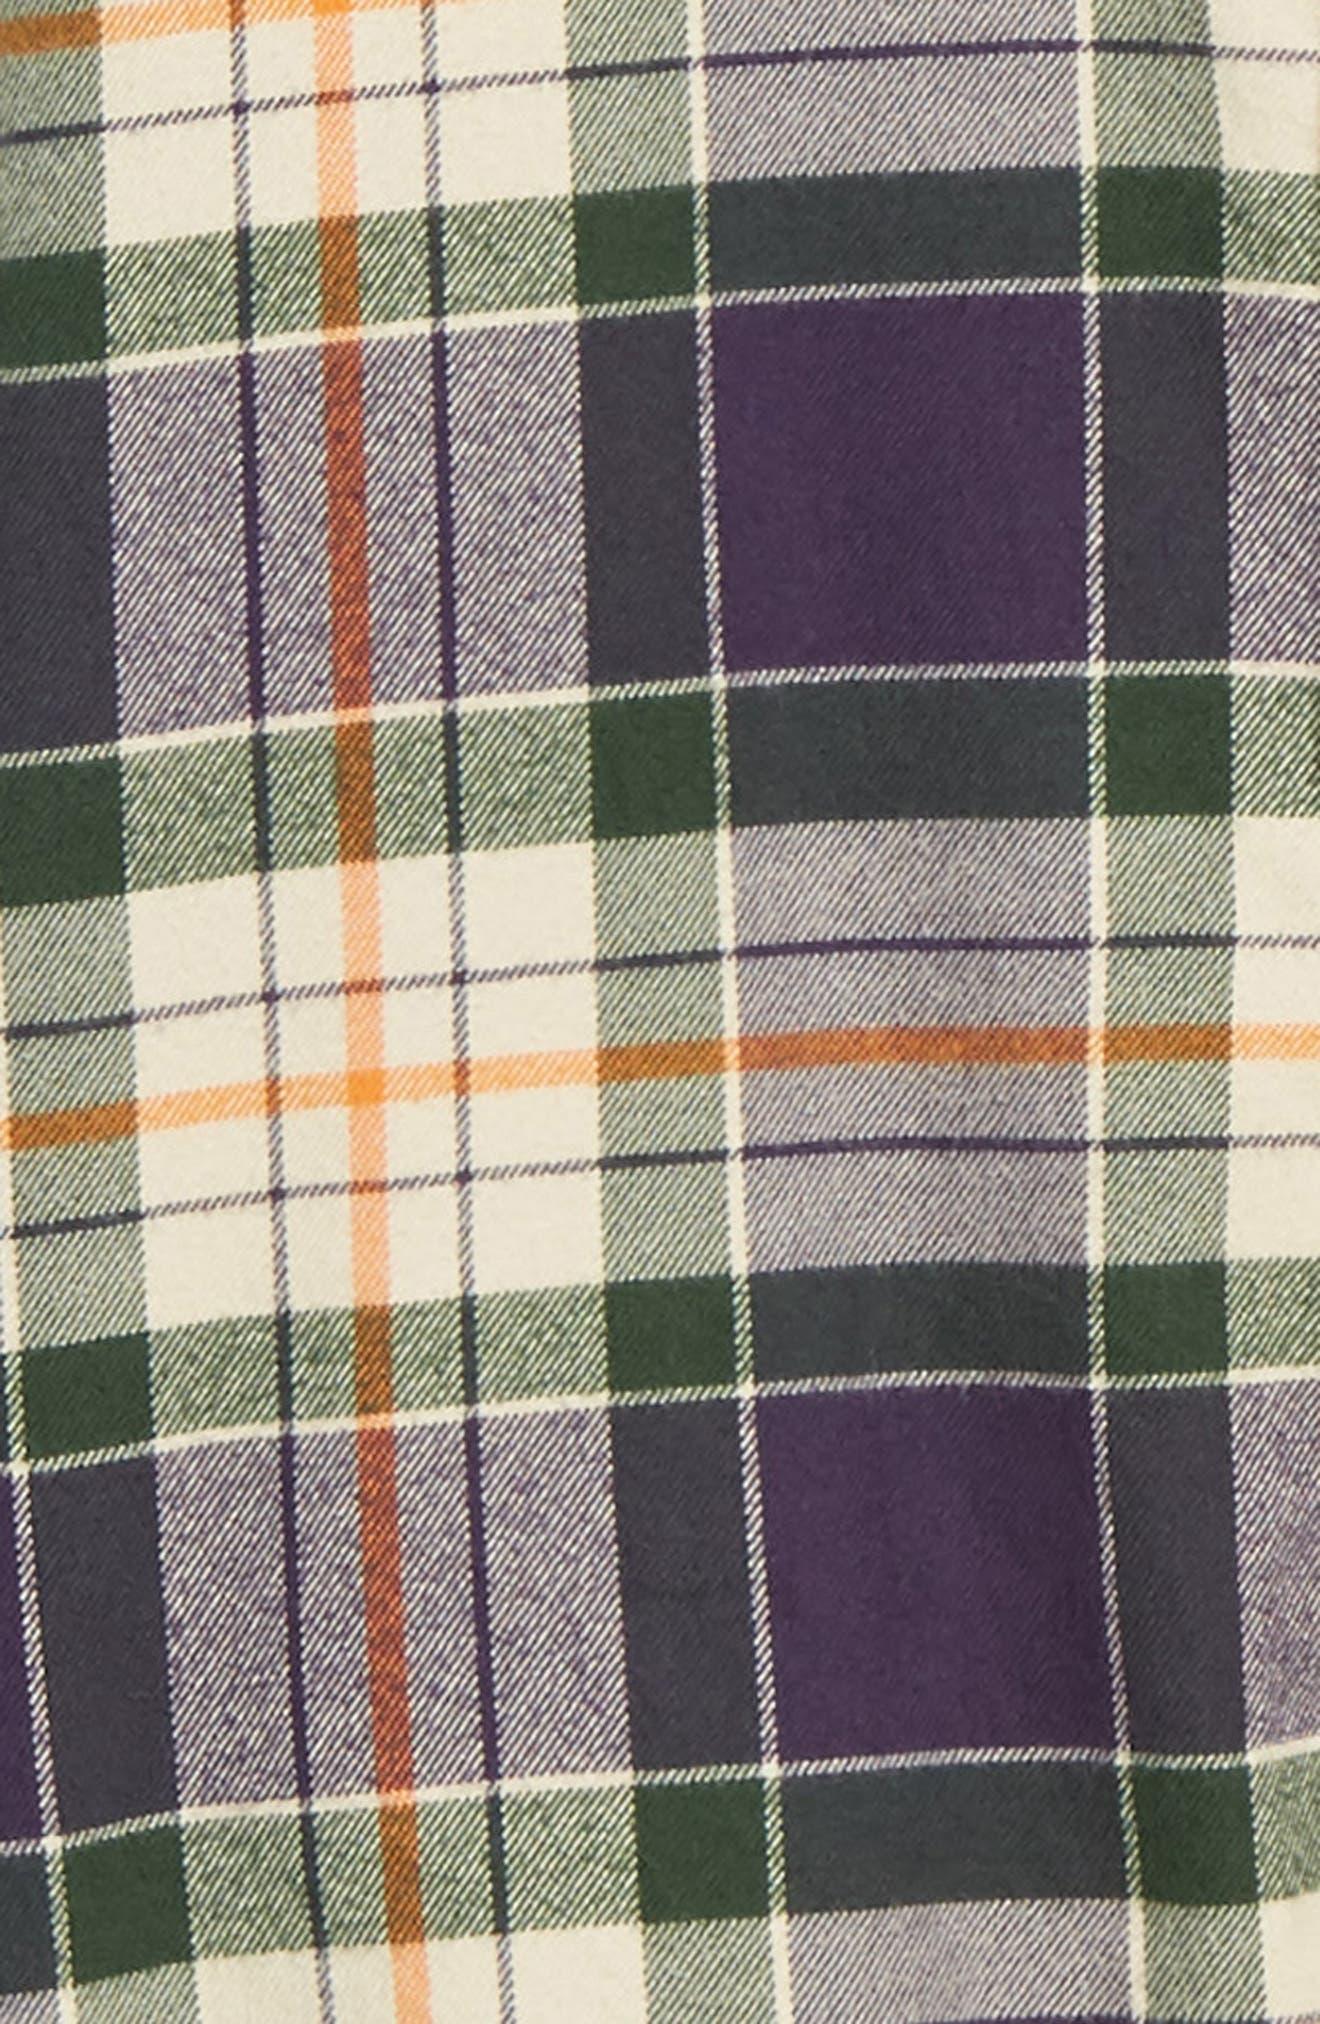 Ovavi Plaid Flannel Shirt,                             Alternate thumbnail 6, color,                             542